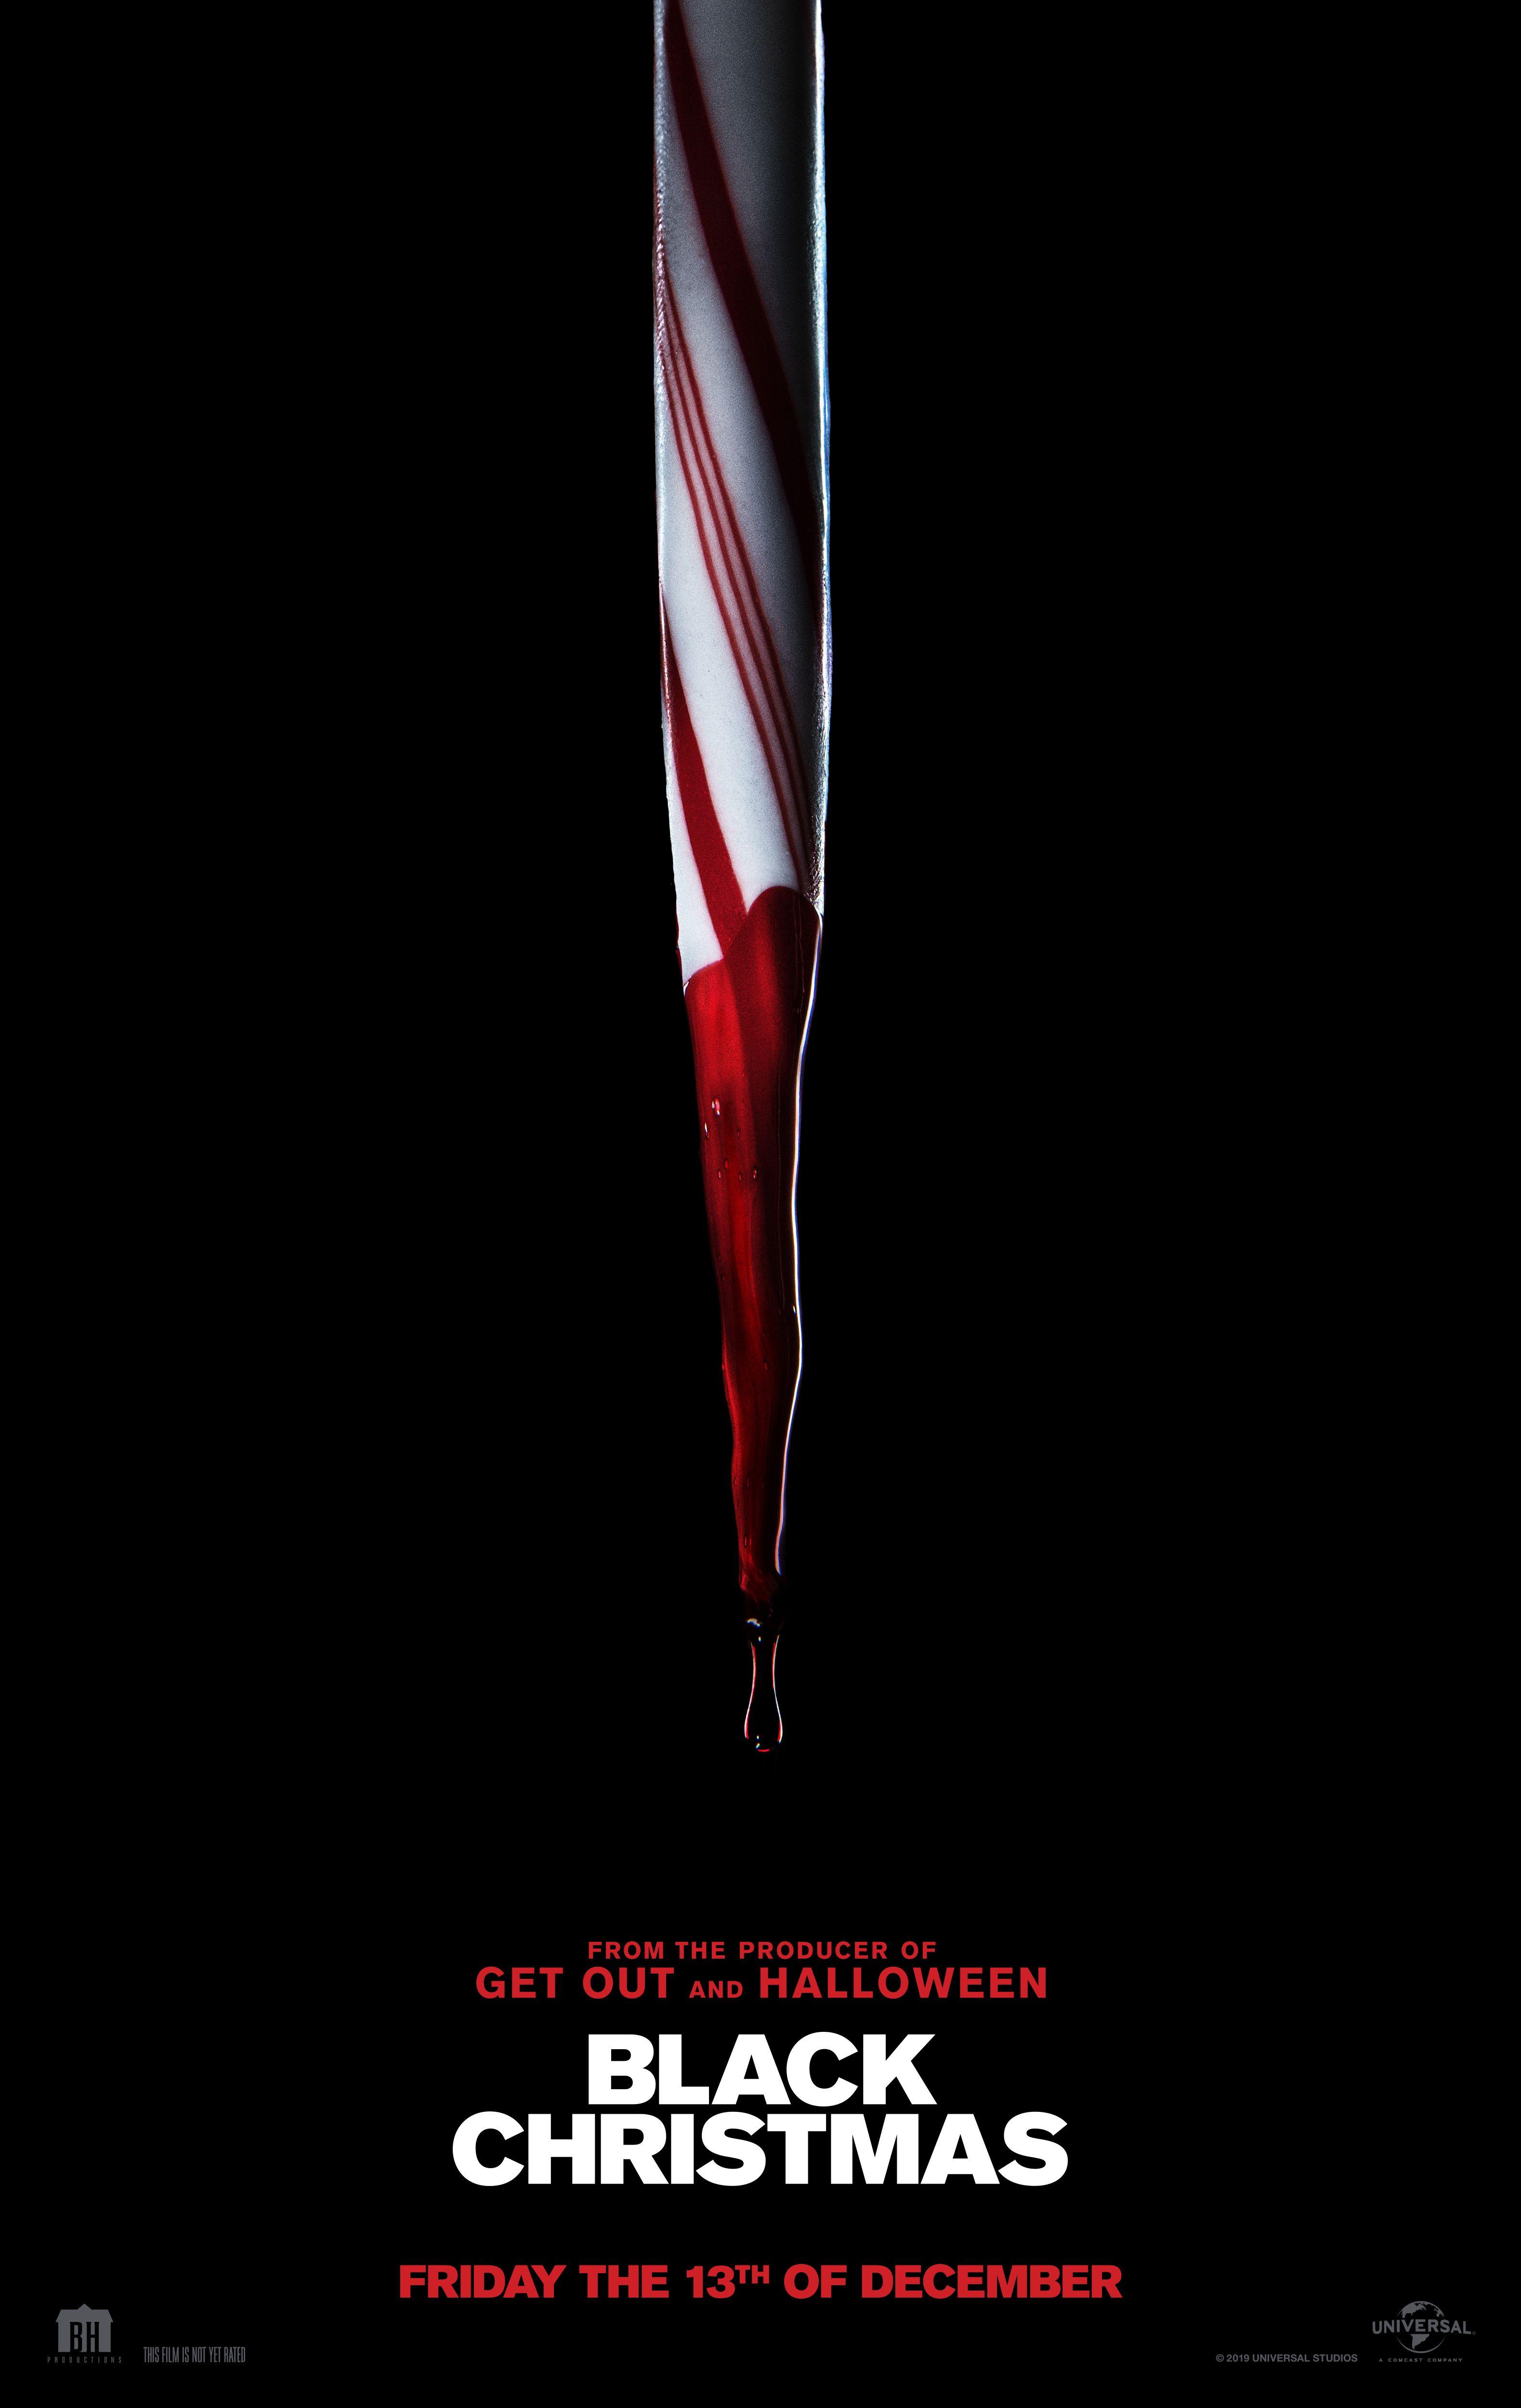 Blumhouse to Remake Black Christmas with Director Sophia Takal